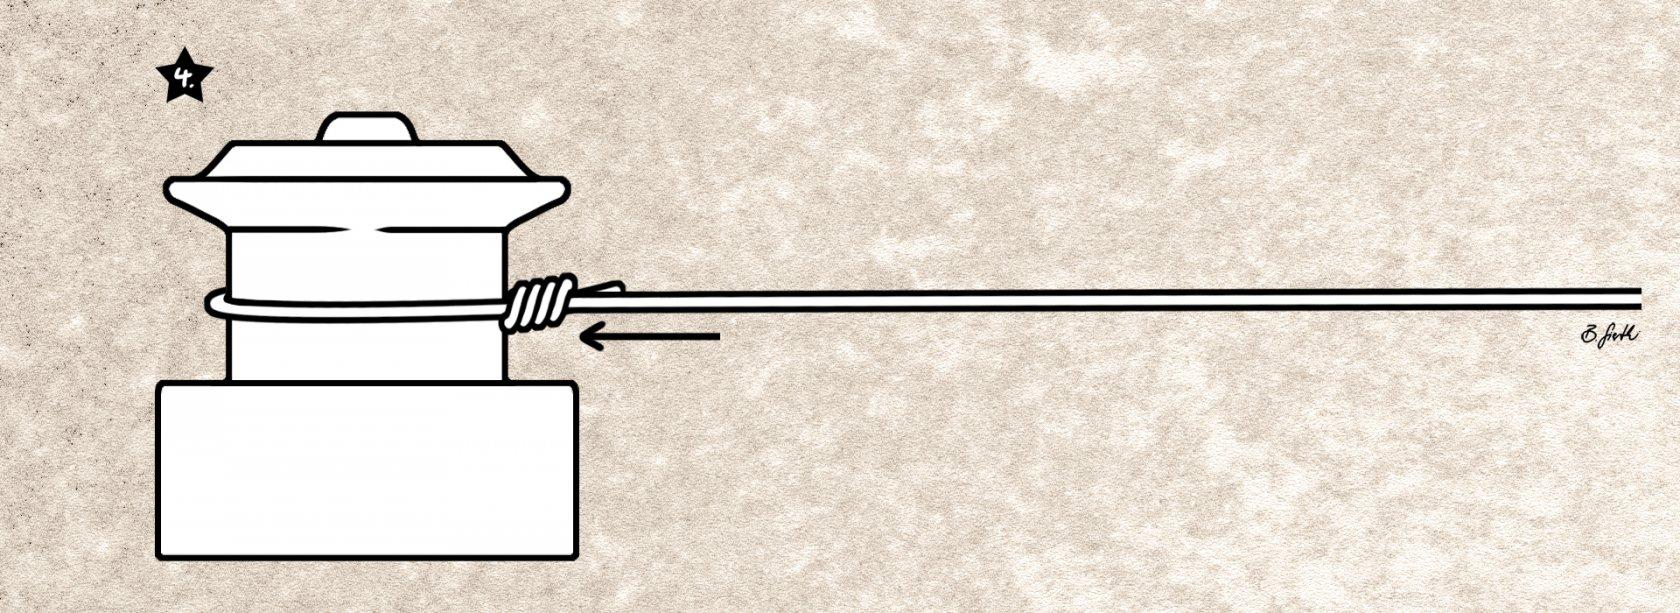 Der fertige Grinner-Spulenknoten